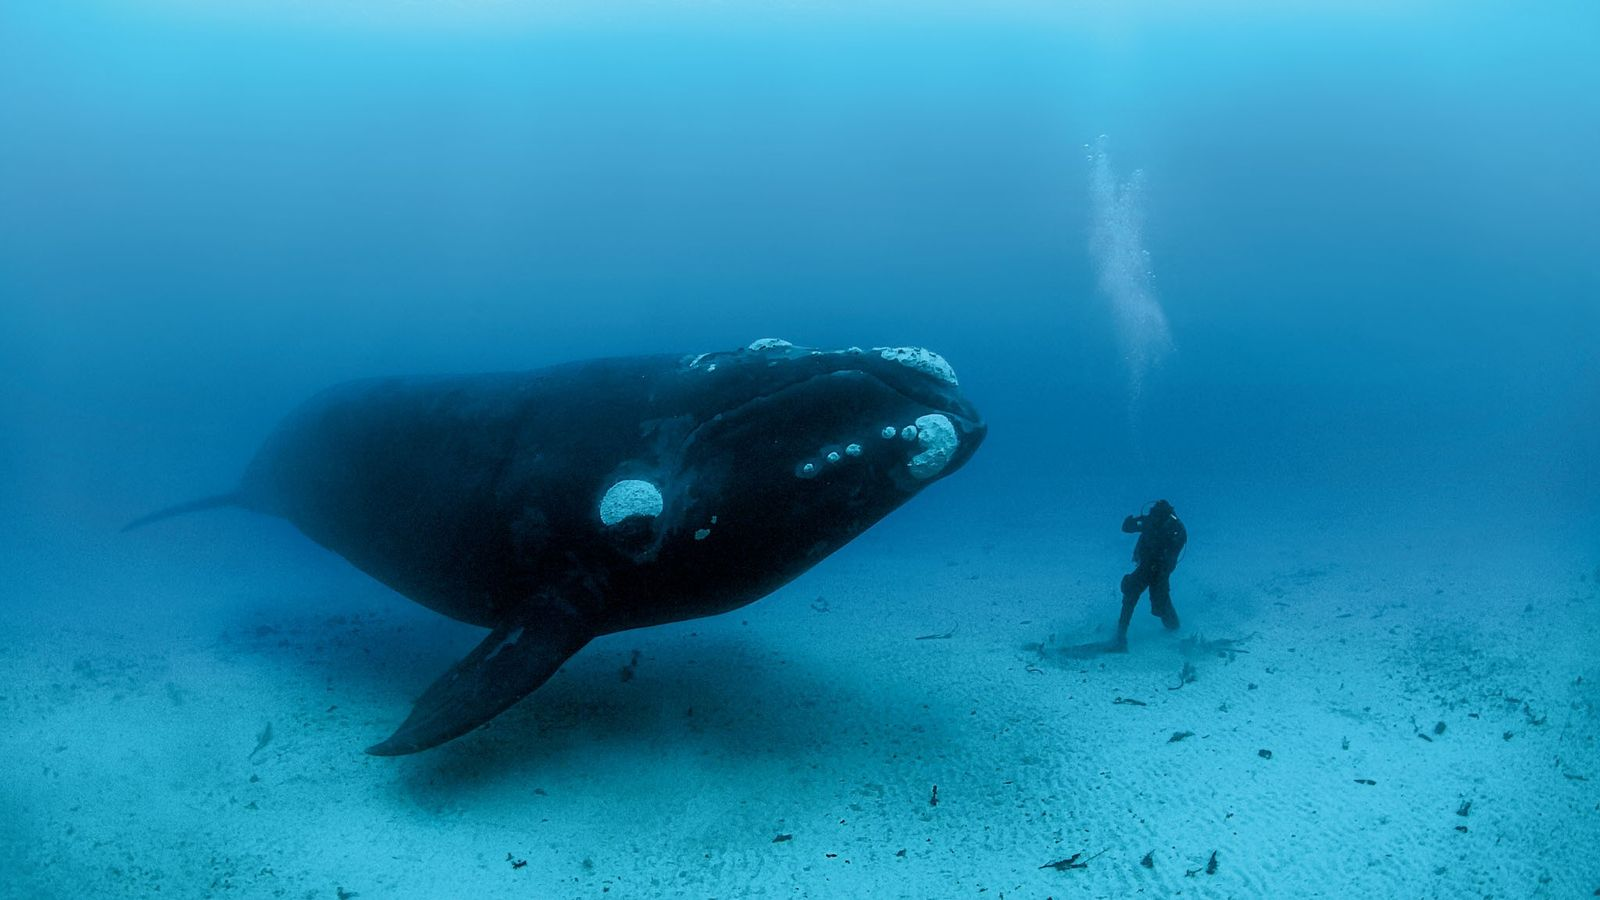 explorador-brian-skerry-baleia